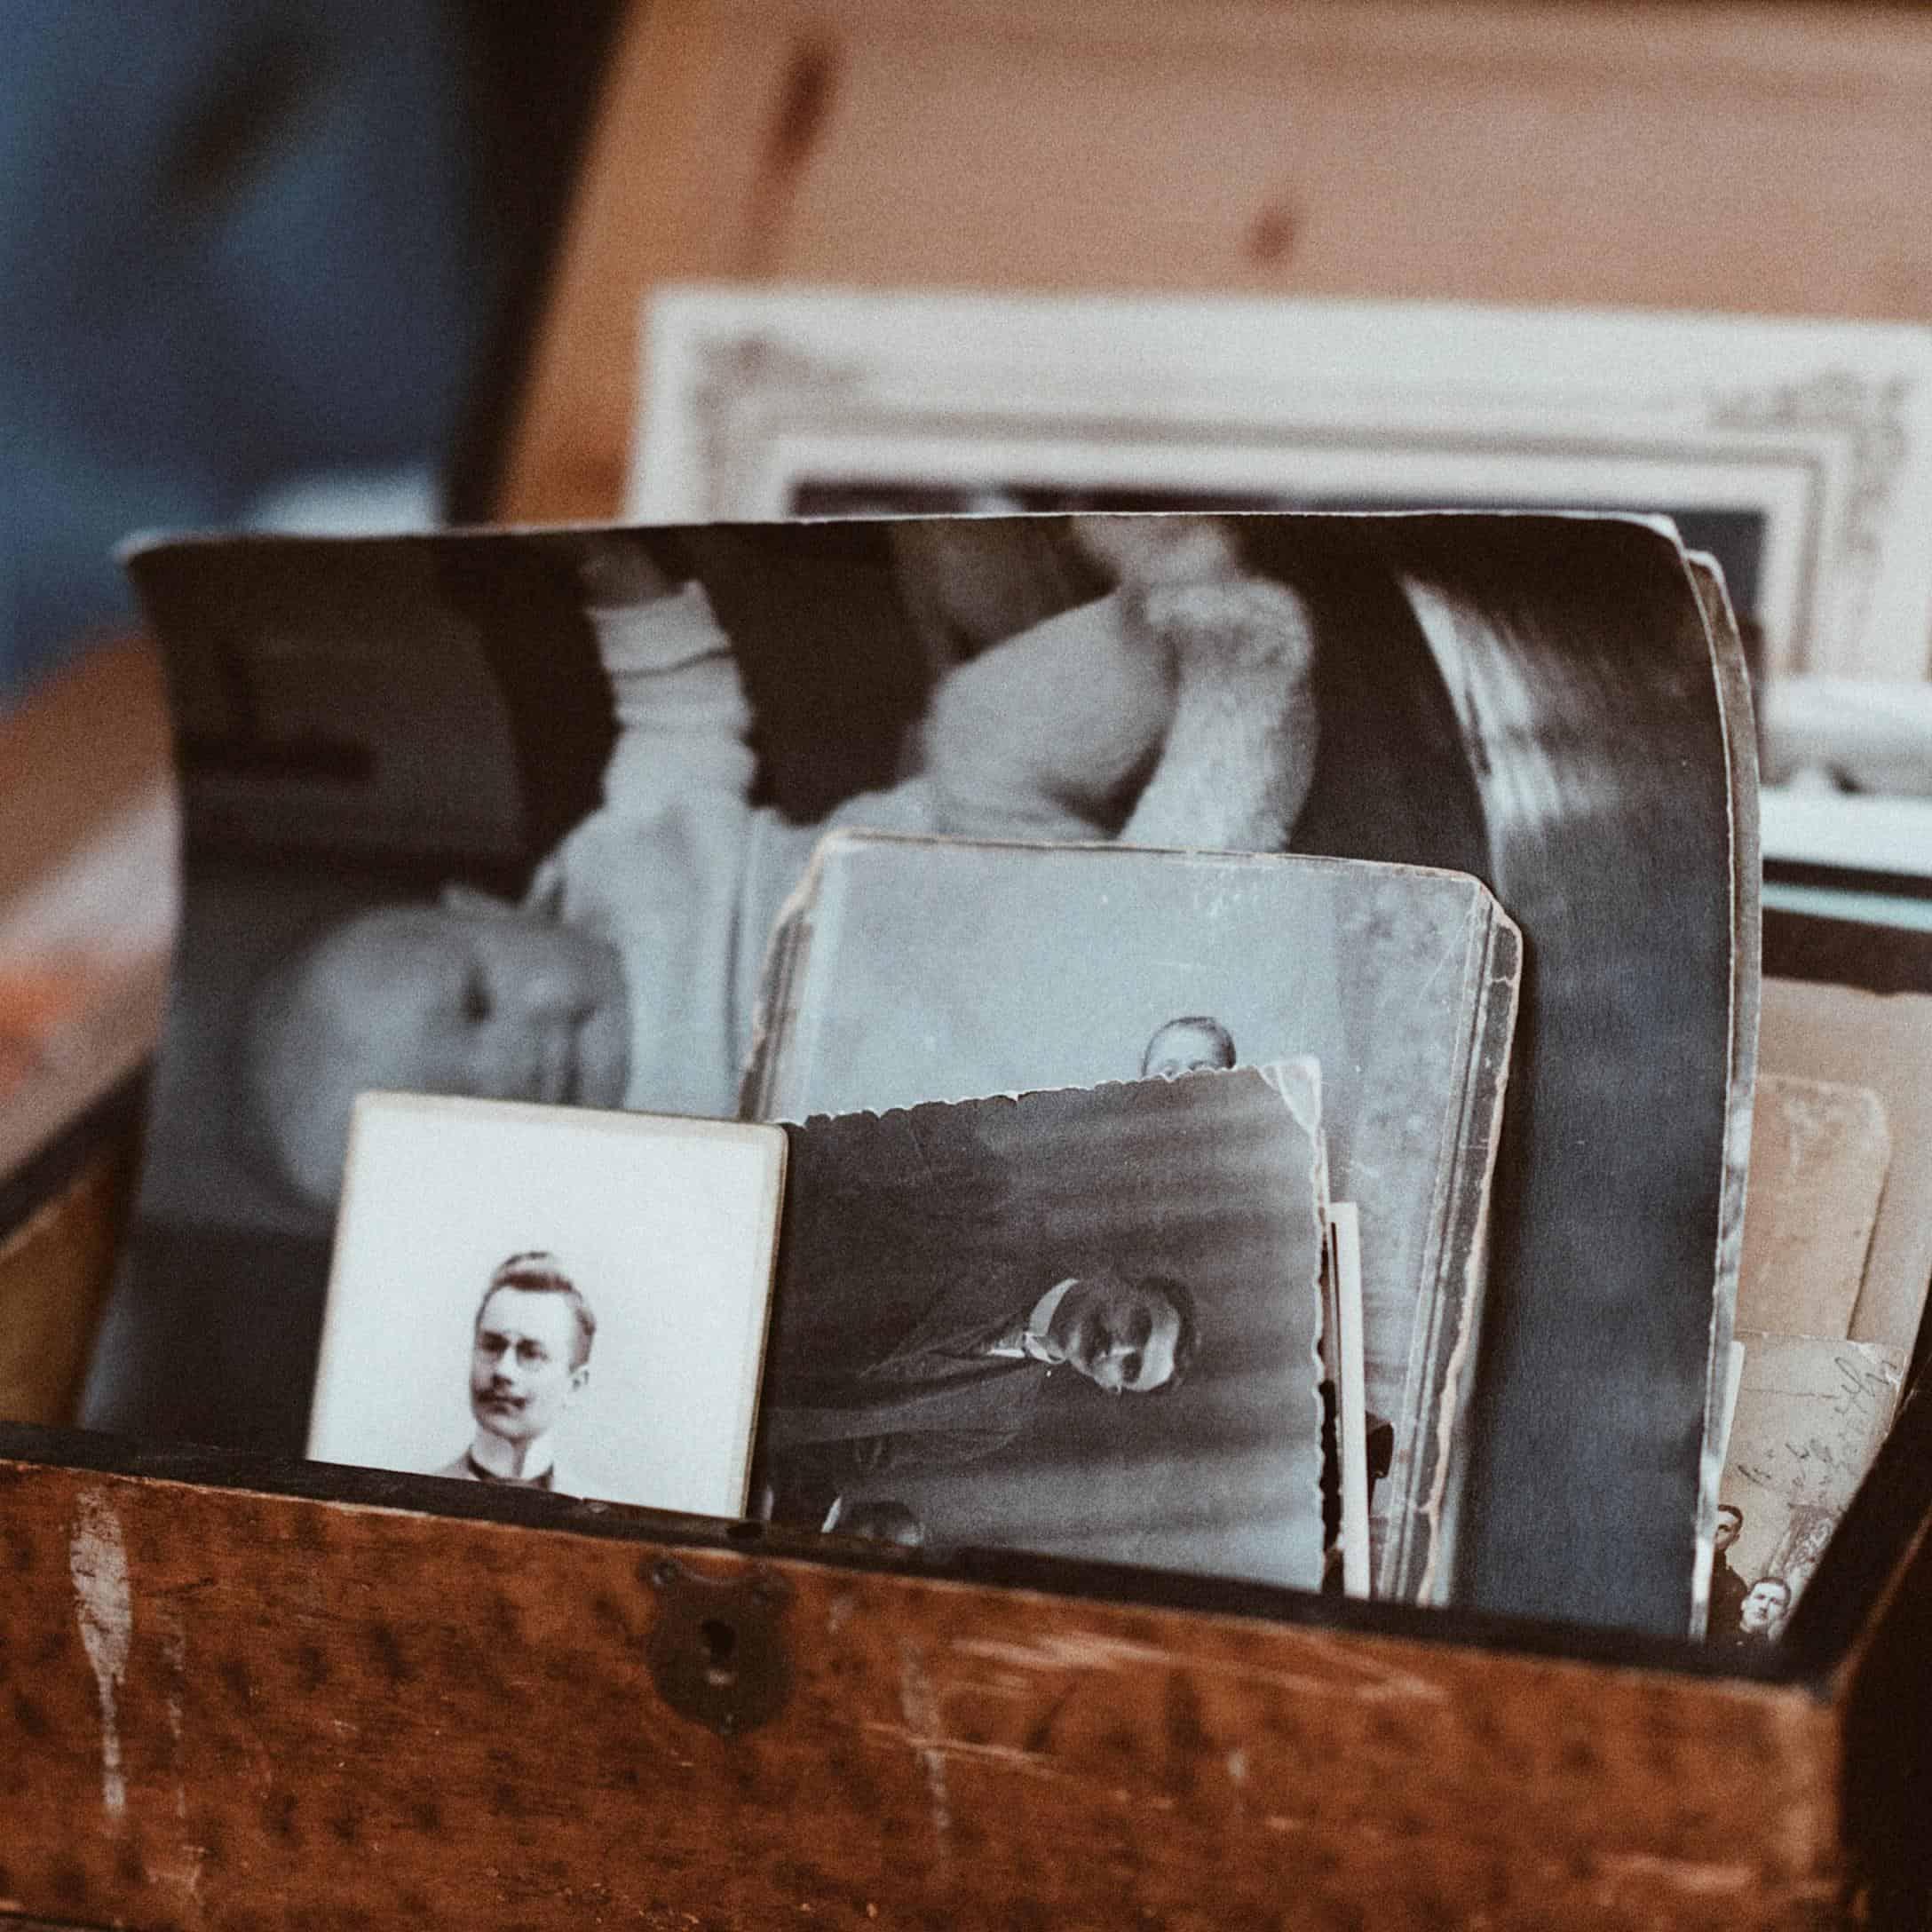 GOWB-staying-organized-during-transition-memories